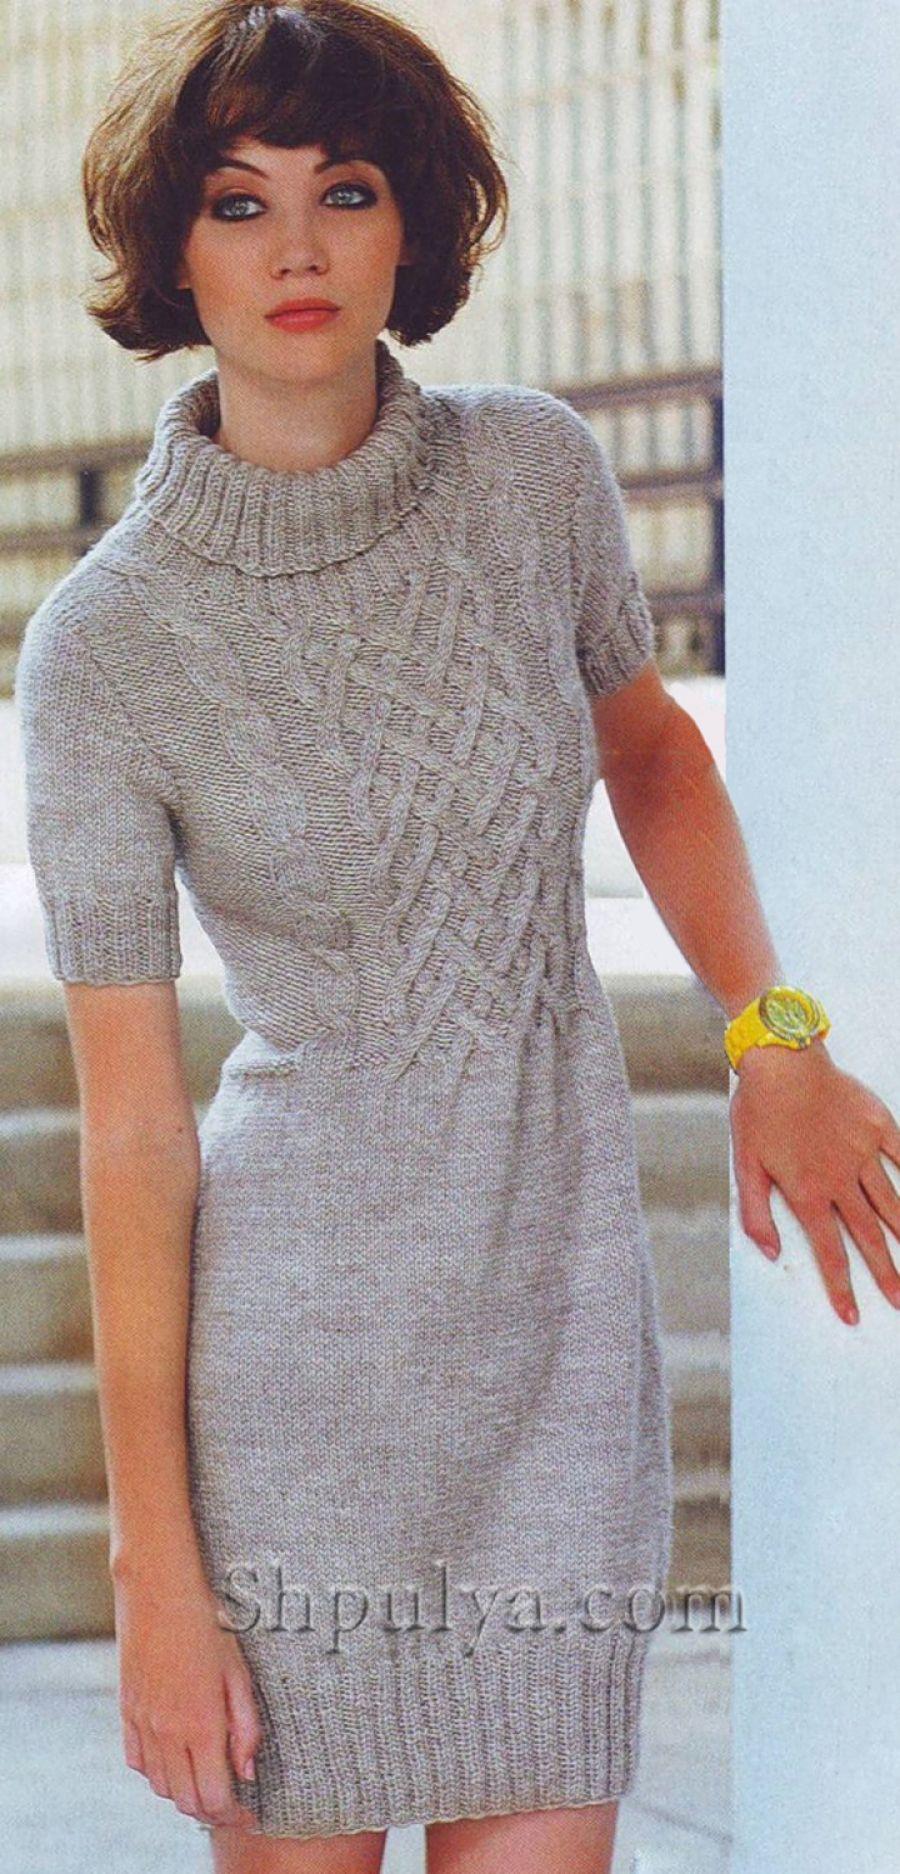 www.SHPULYA.com - Платье с плетеным узором, вязаное спицами   Knit ...